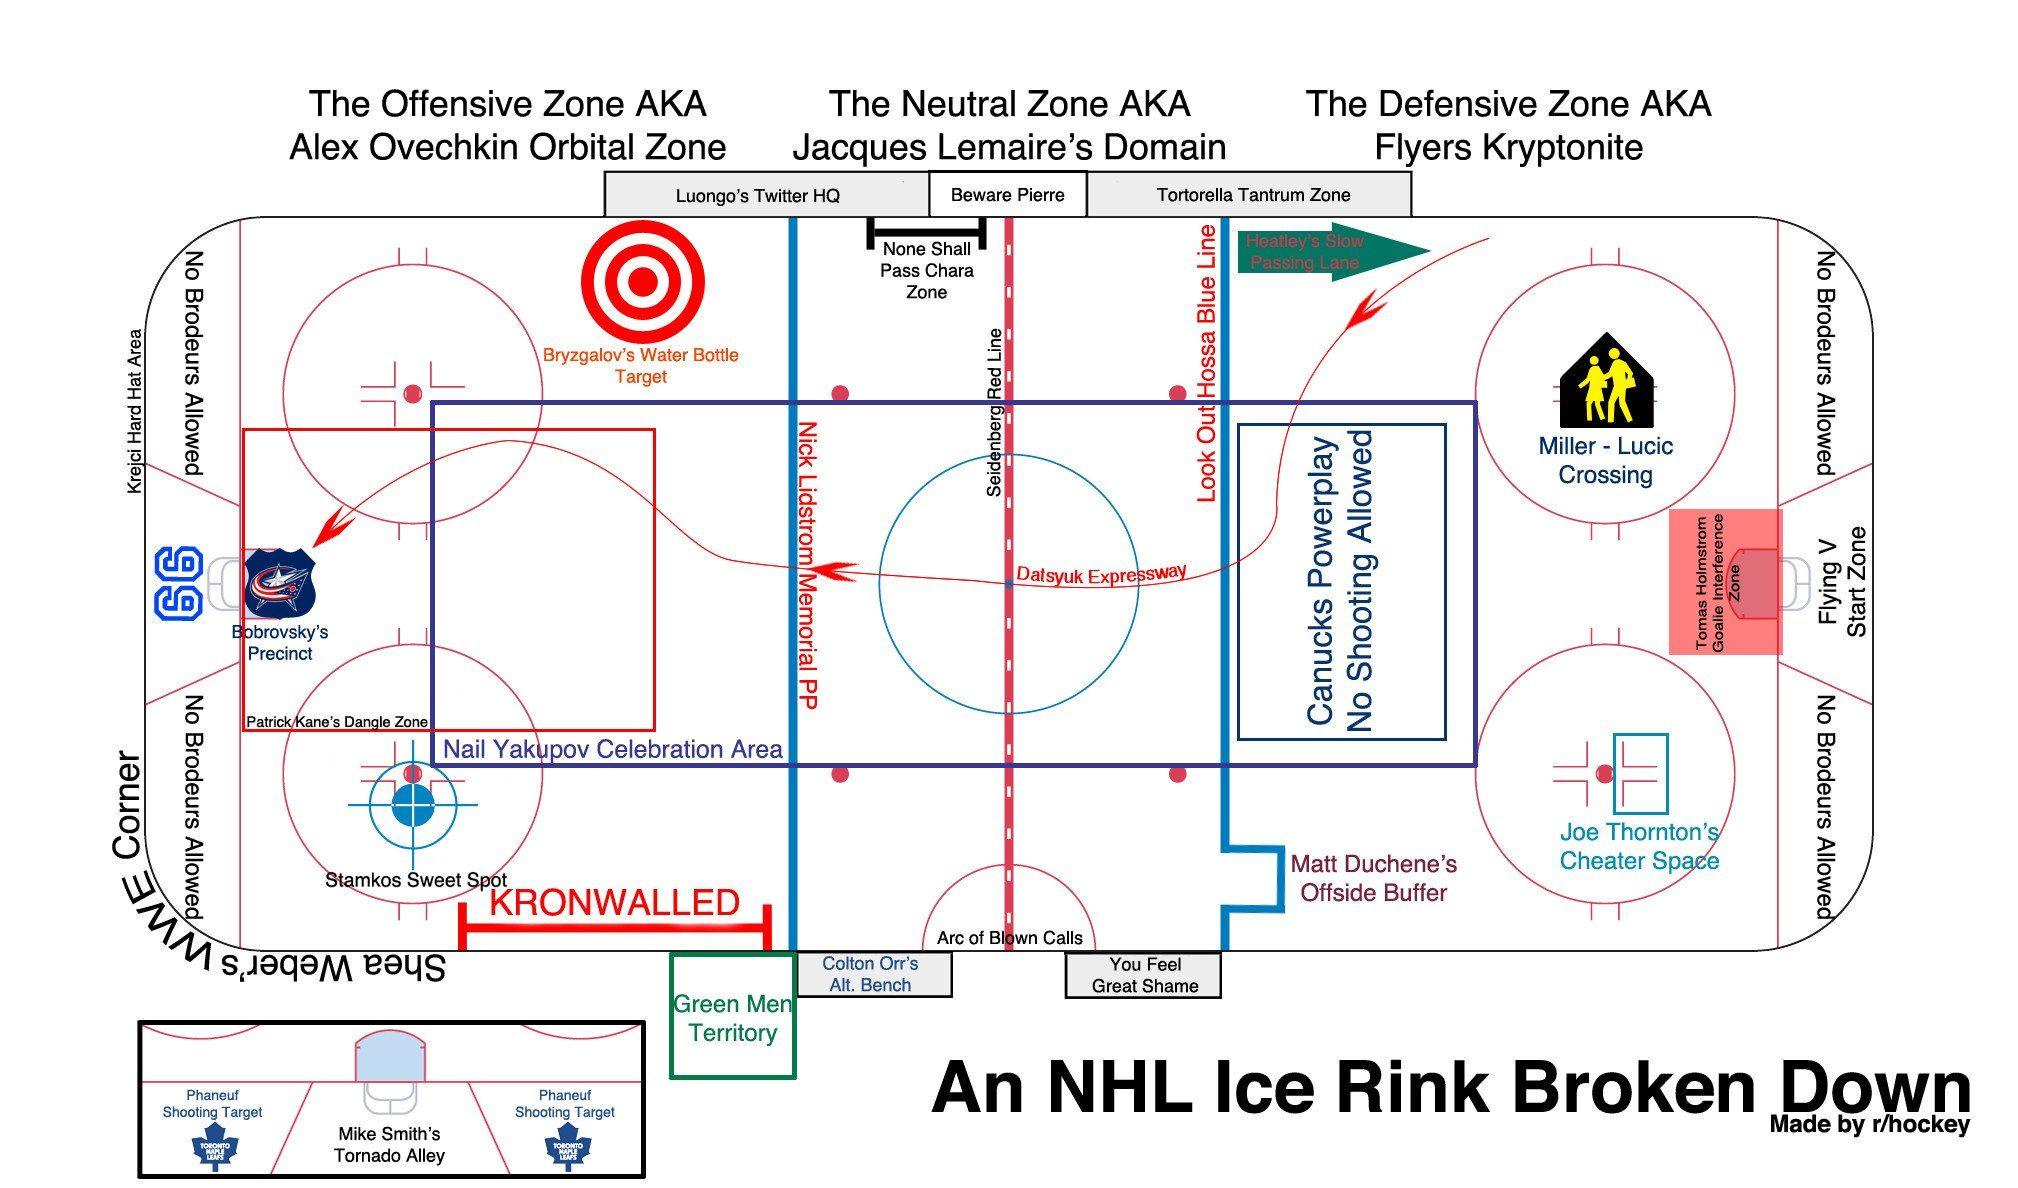 An Nhl Ice Rink Broken Down Patinoire Hockey Sur Glace Dek Hockey